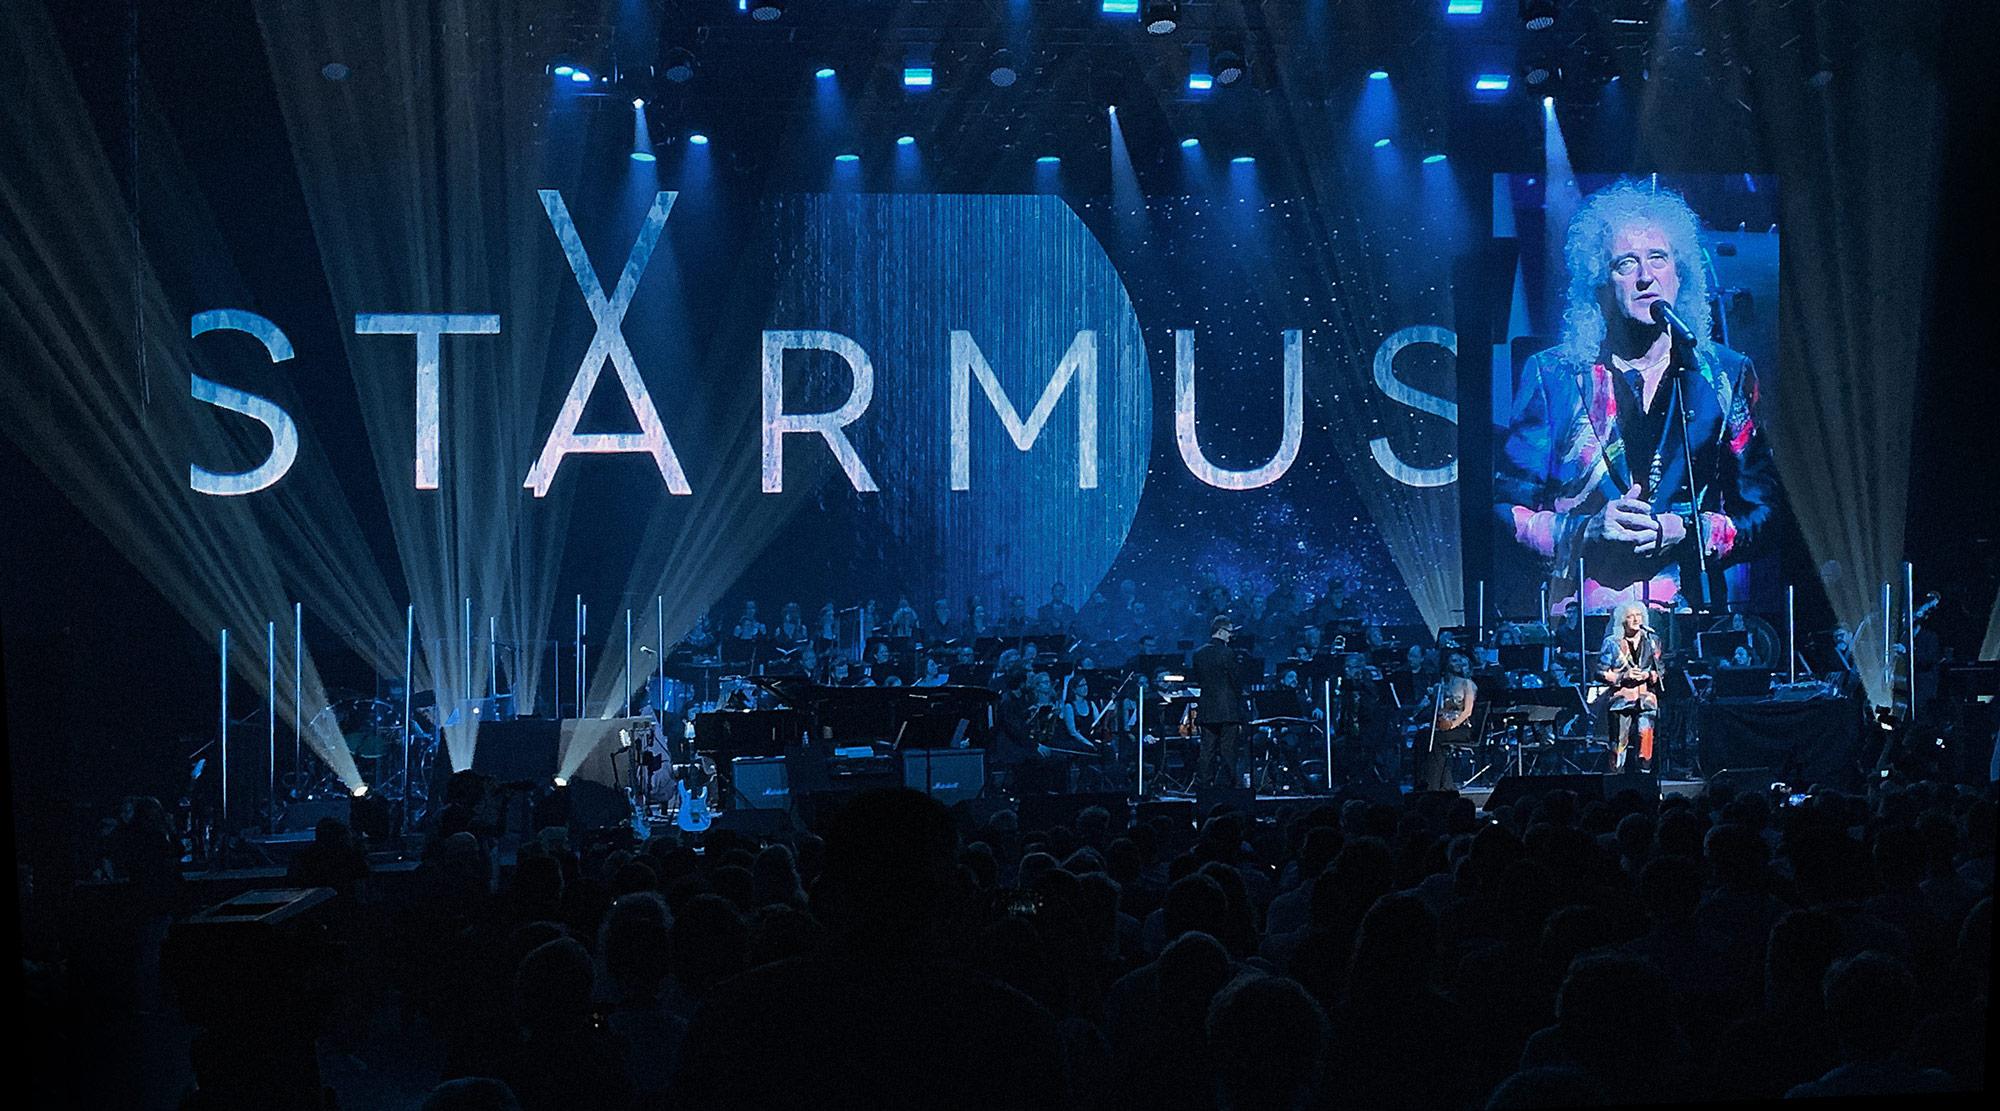 starmus-brian-may2.jpg